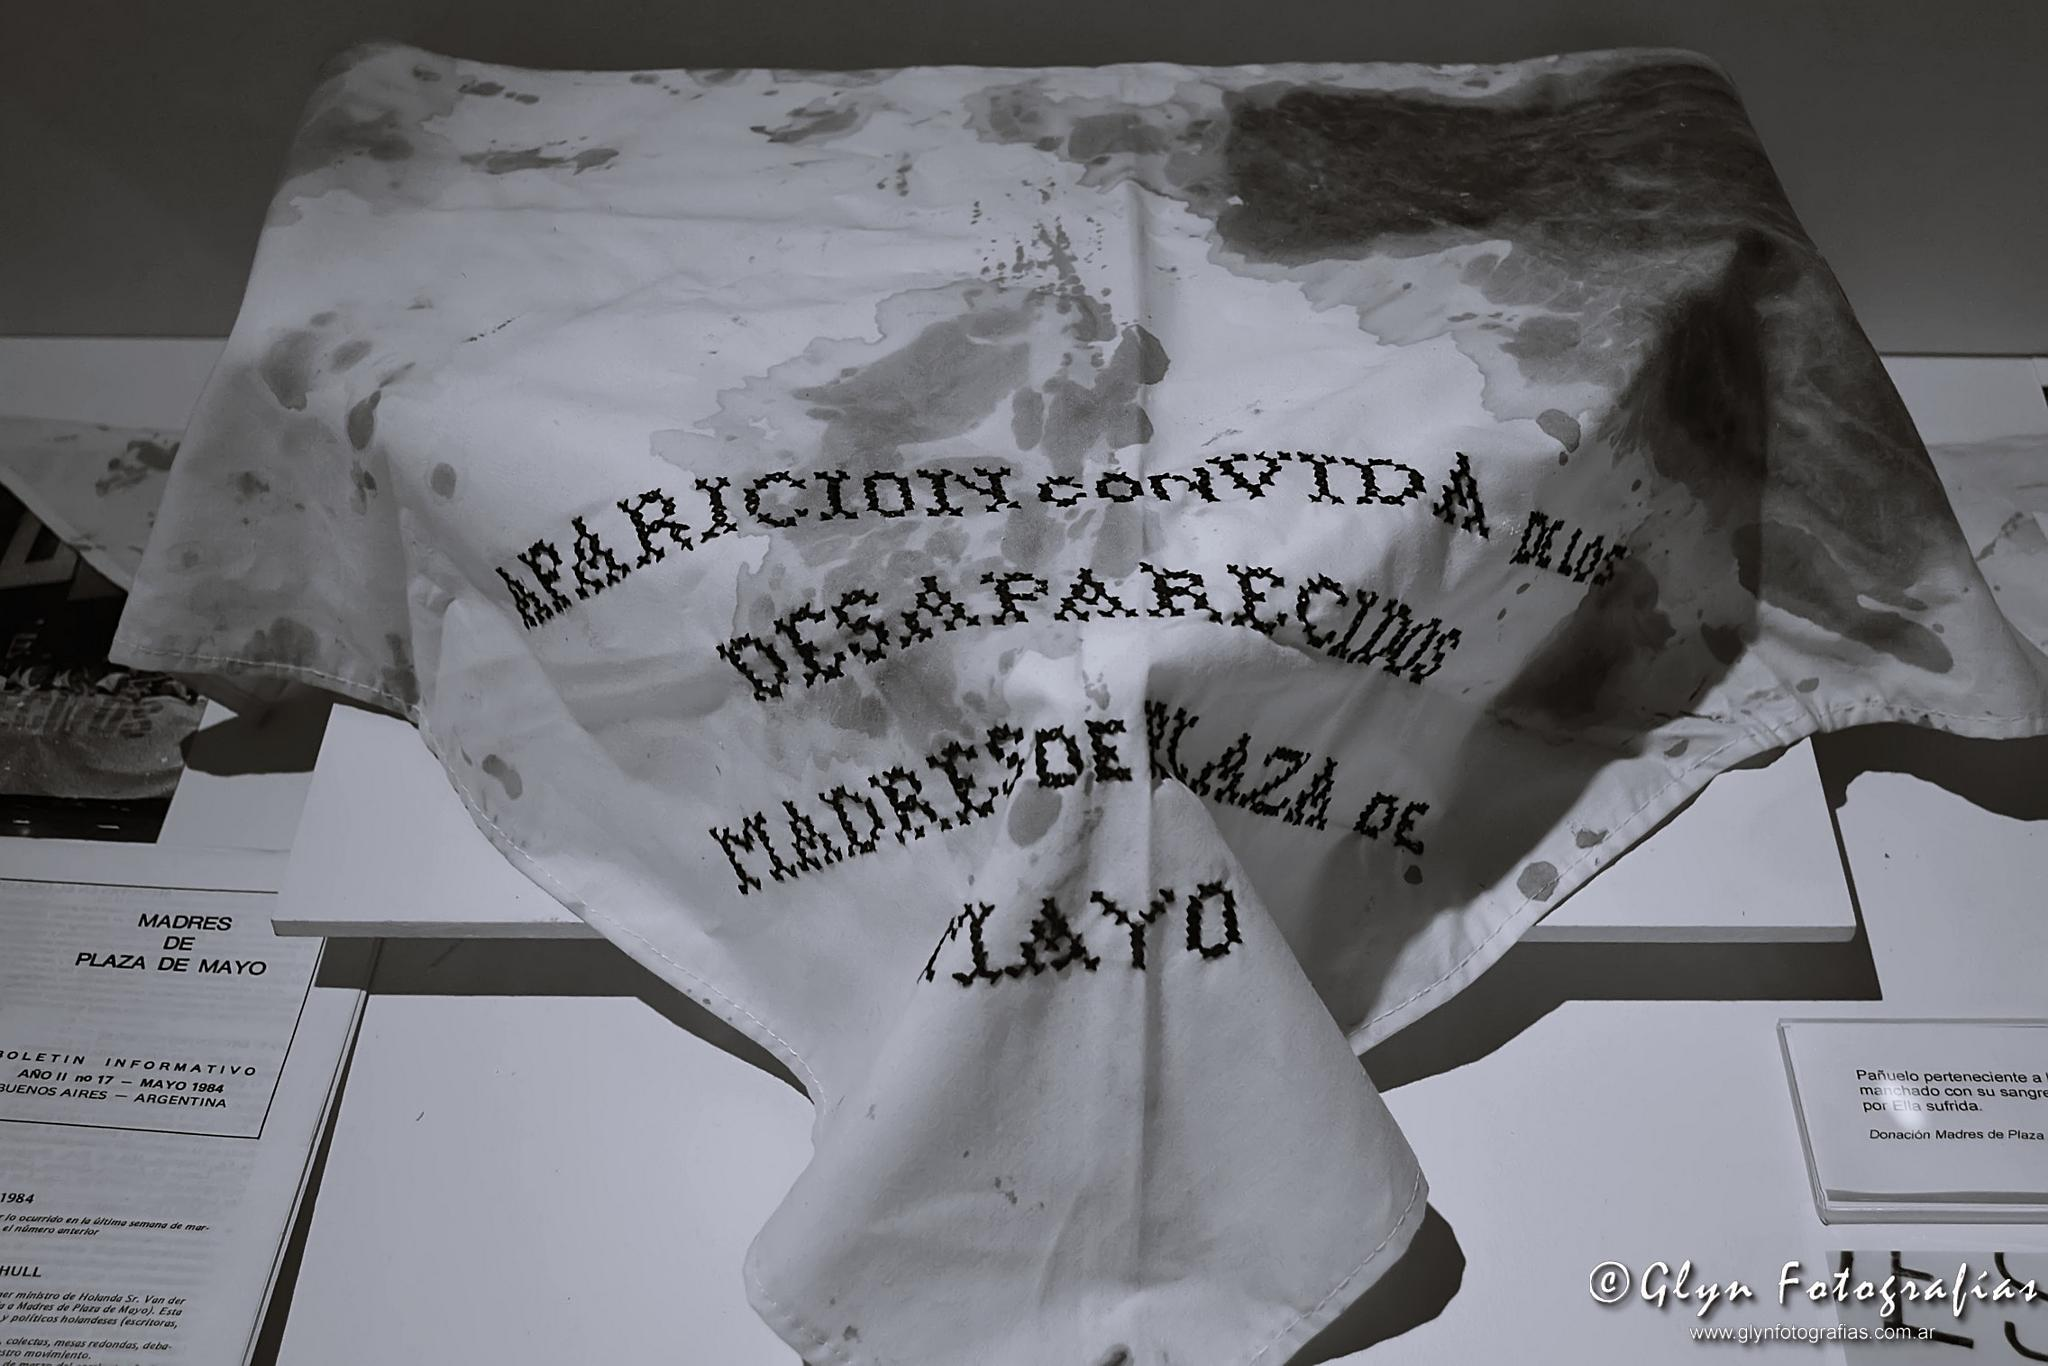 Madres de Plaza de Mayo by GlynFotografias